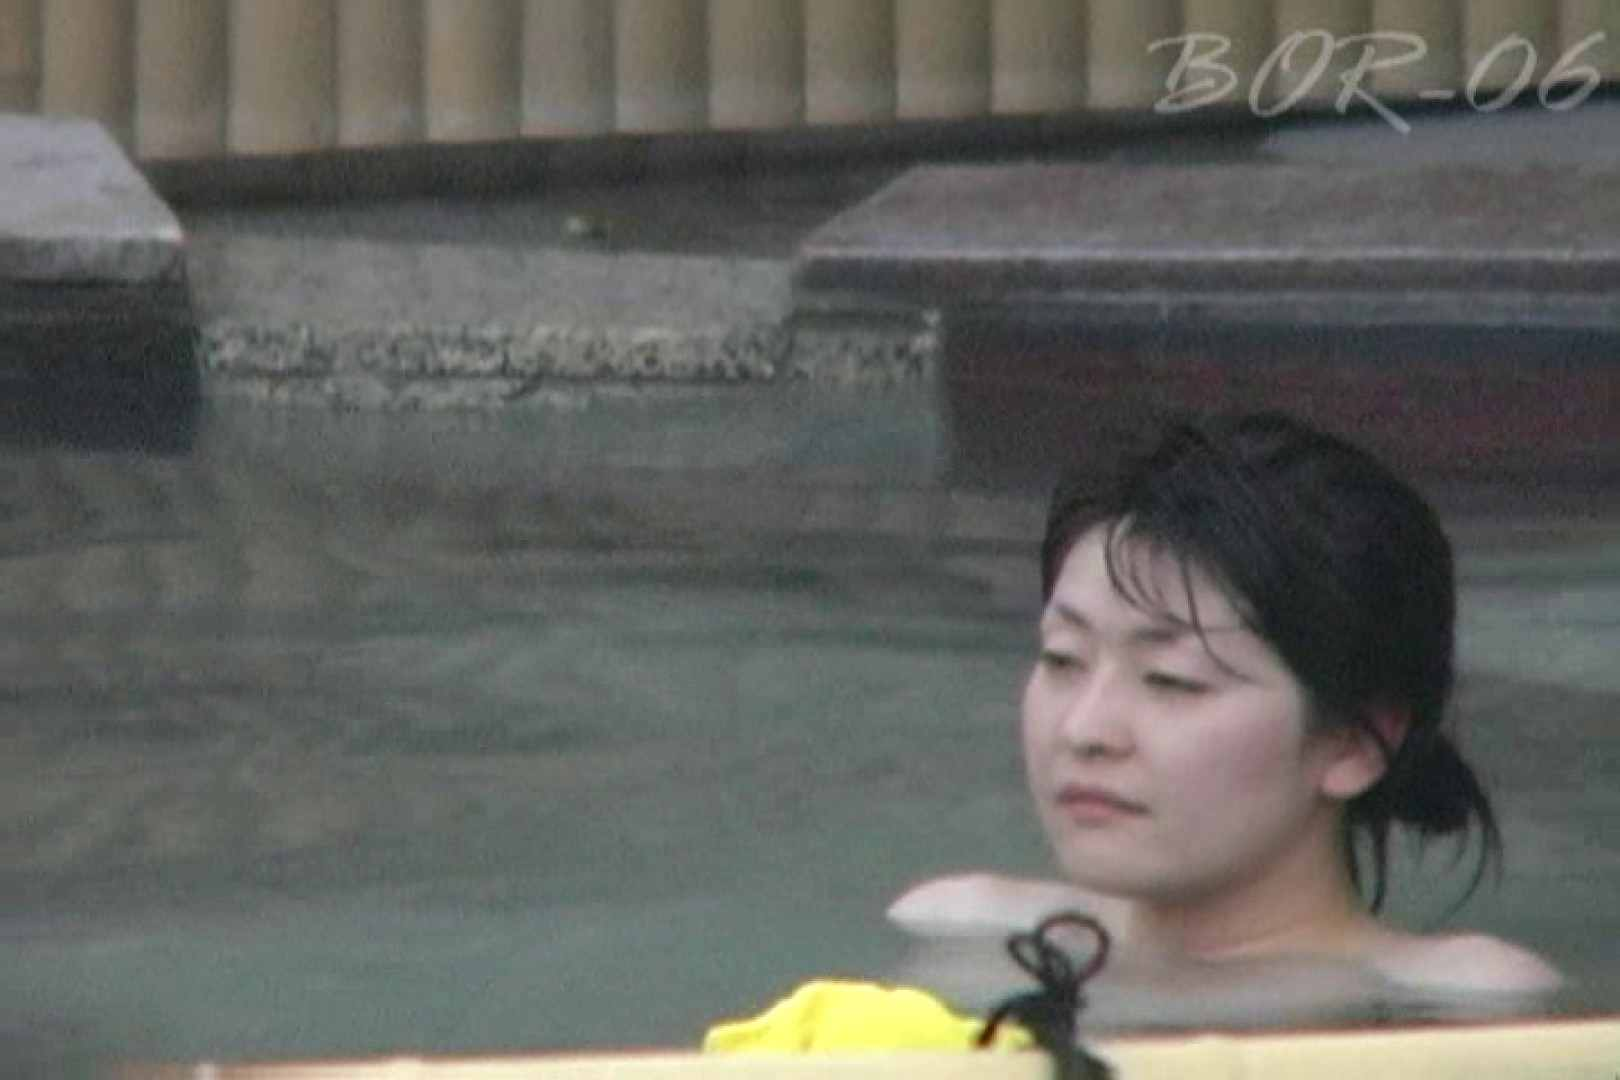 Aquaな露天風呂Vol.523 盗撮 ワレメ無修正動画無料 88枚 77